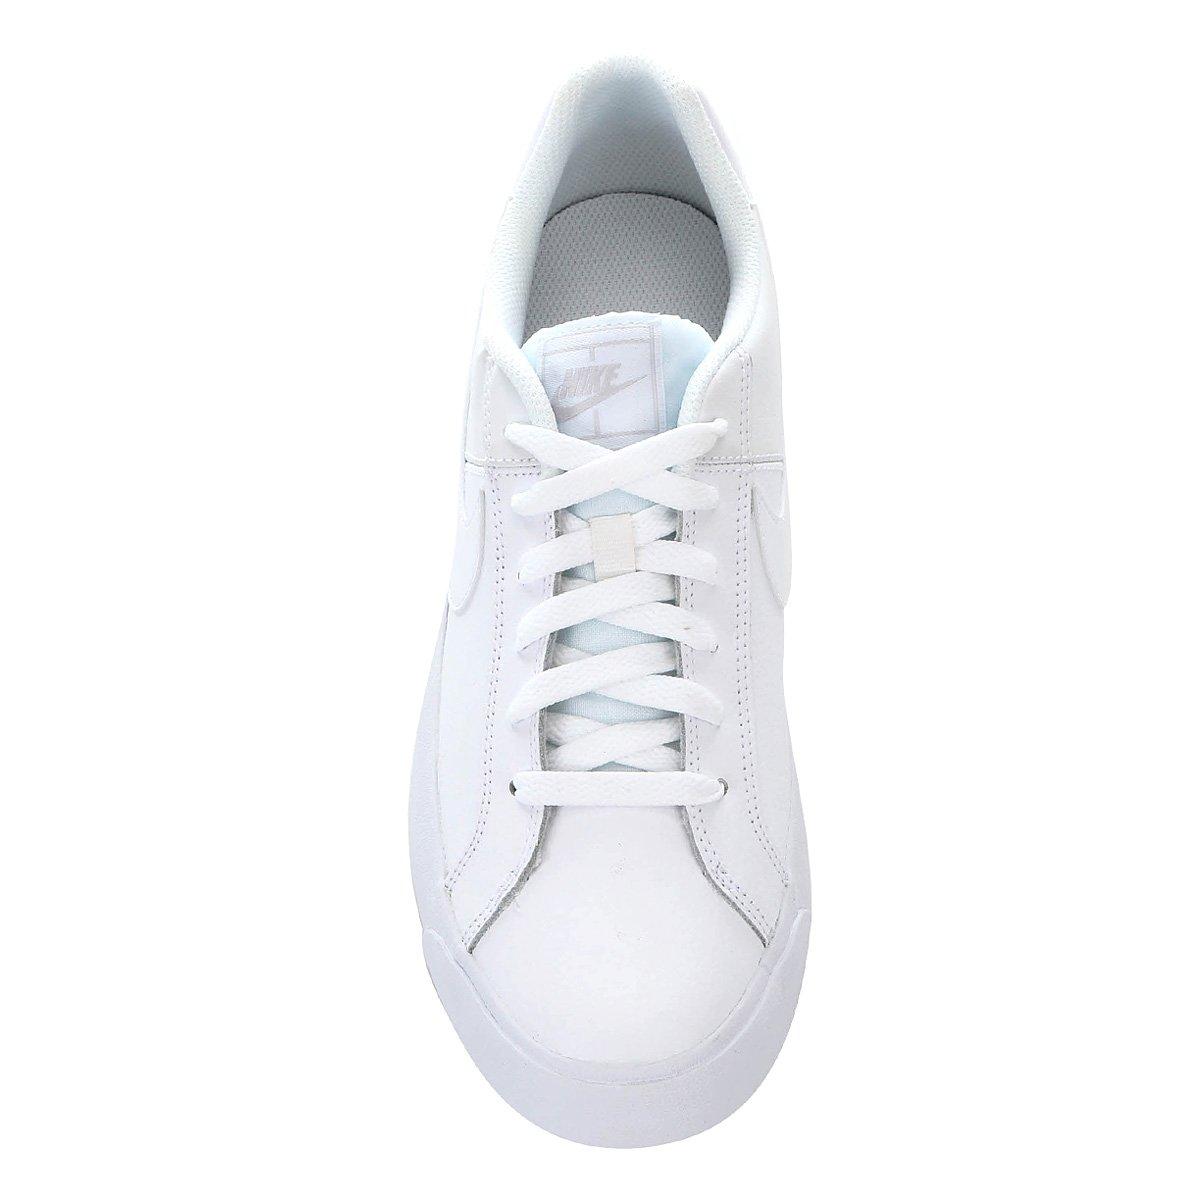 e6768925c6 Tênis Nike Court Royale Ac Masculino - Tam: 40 - Shopping TudoAzul